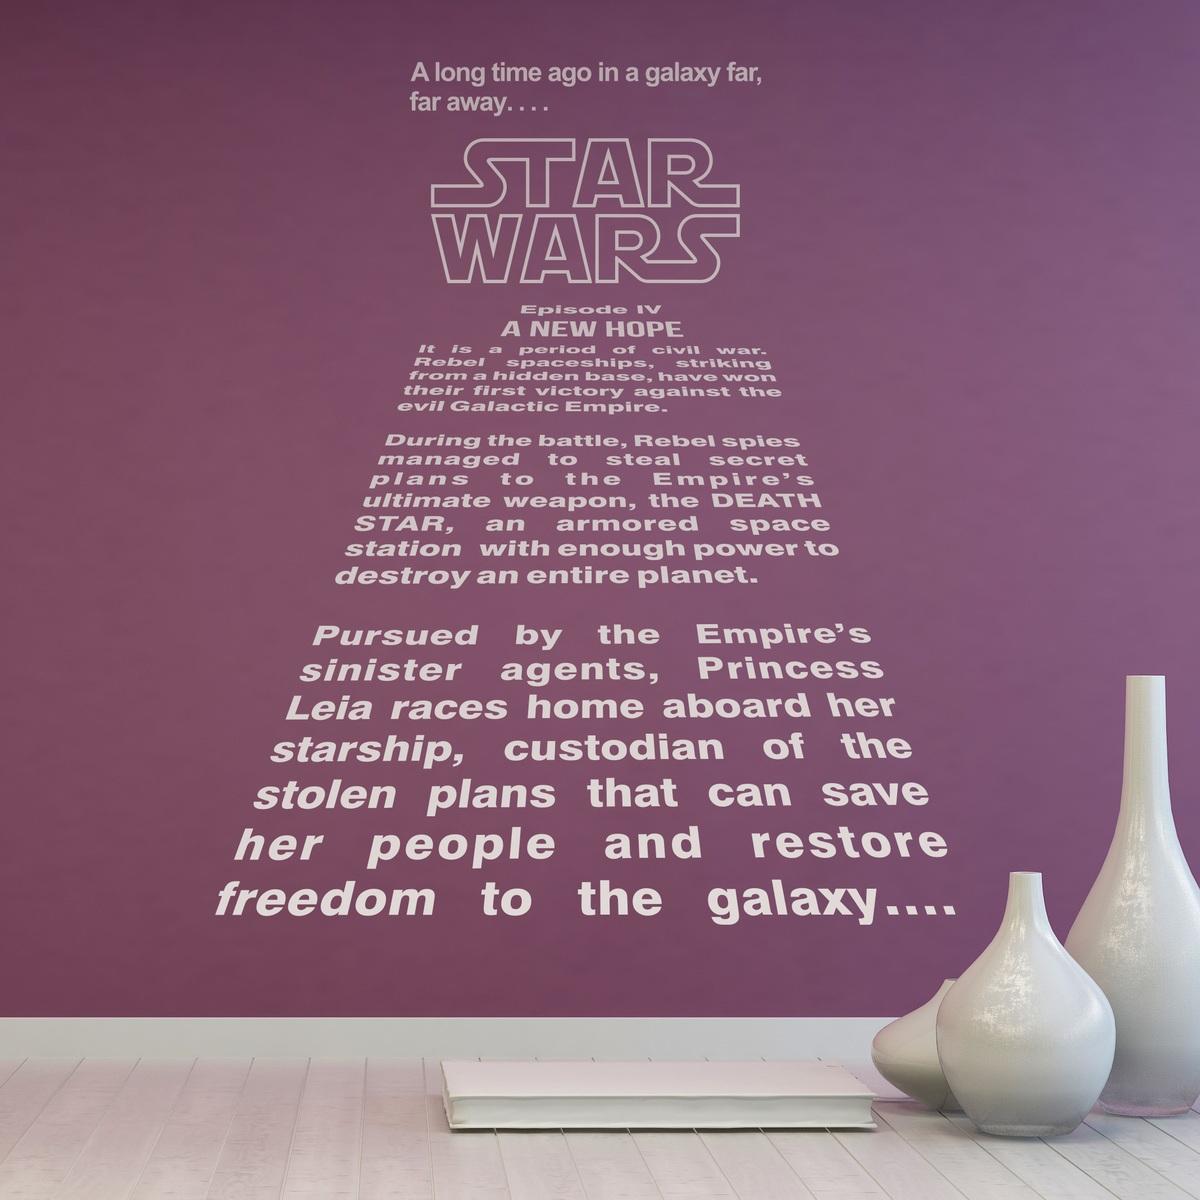 star wars texte d introduction. Black Bedroom Furniture Sets. Home Design Ideas